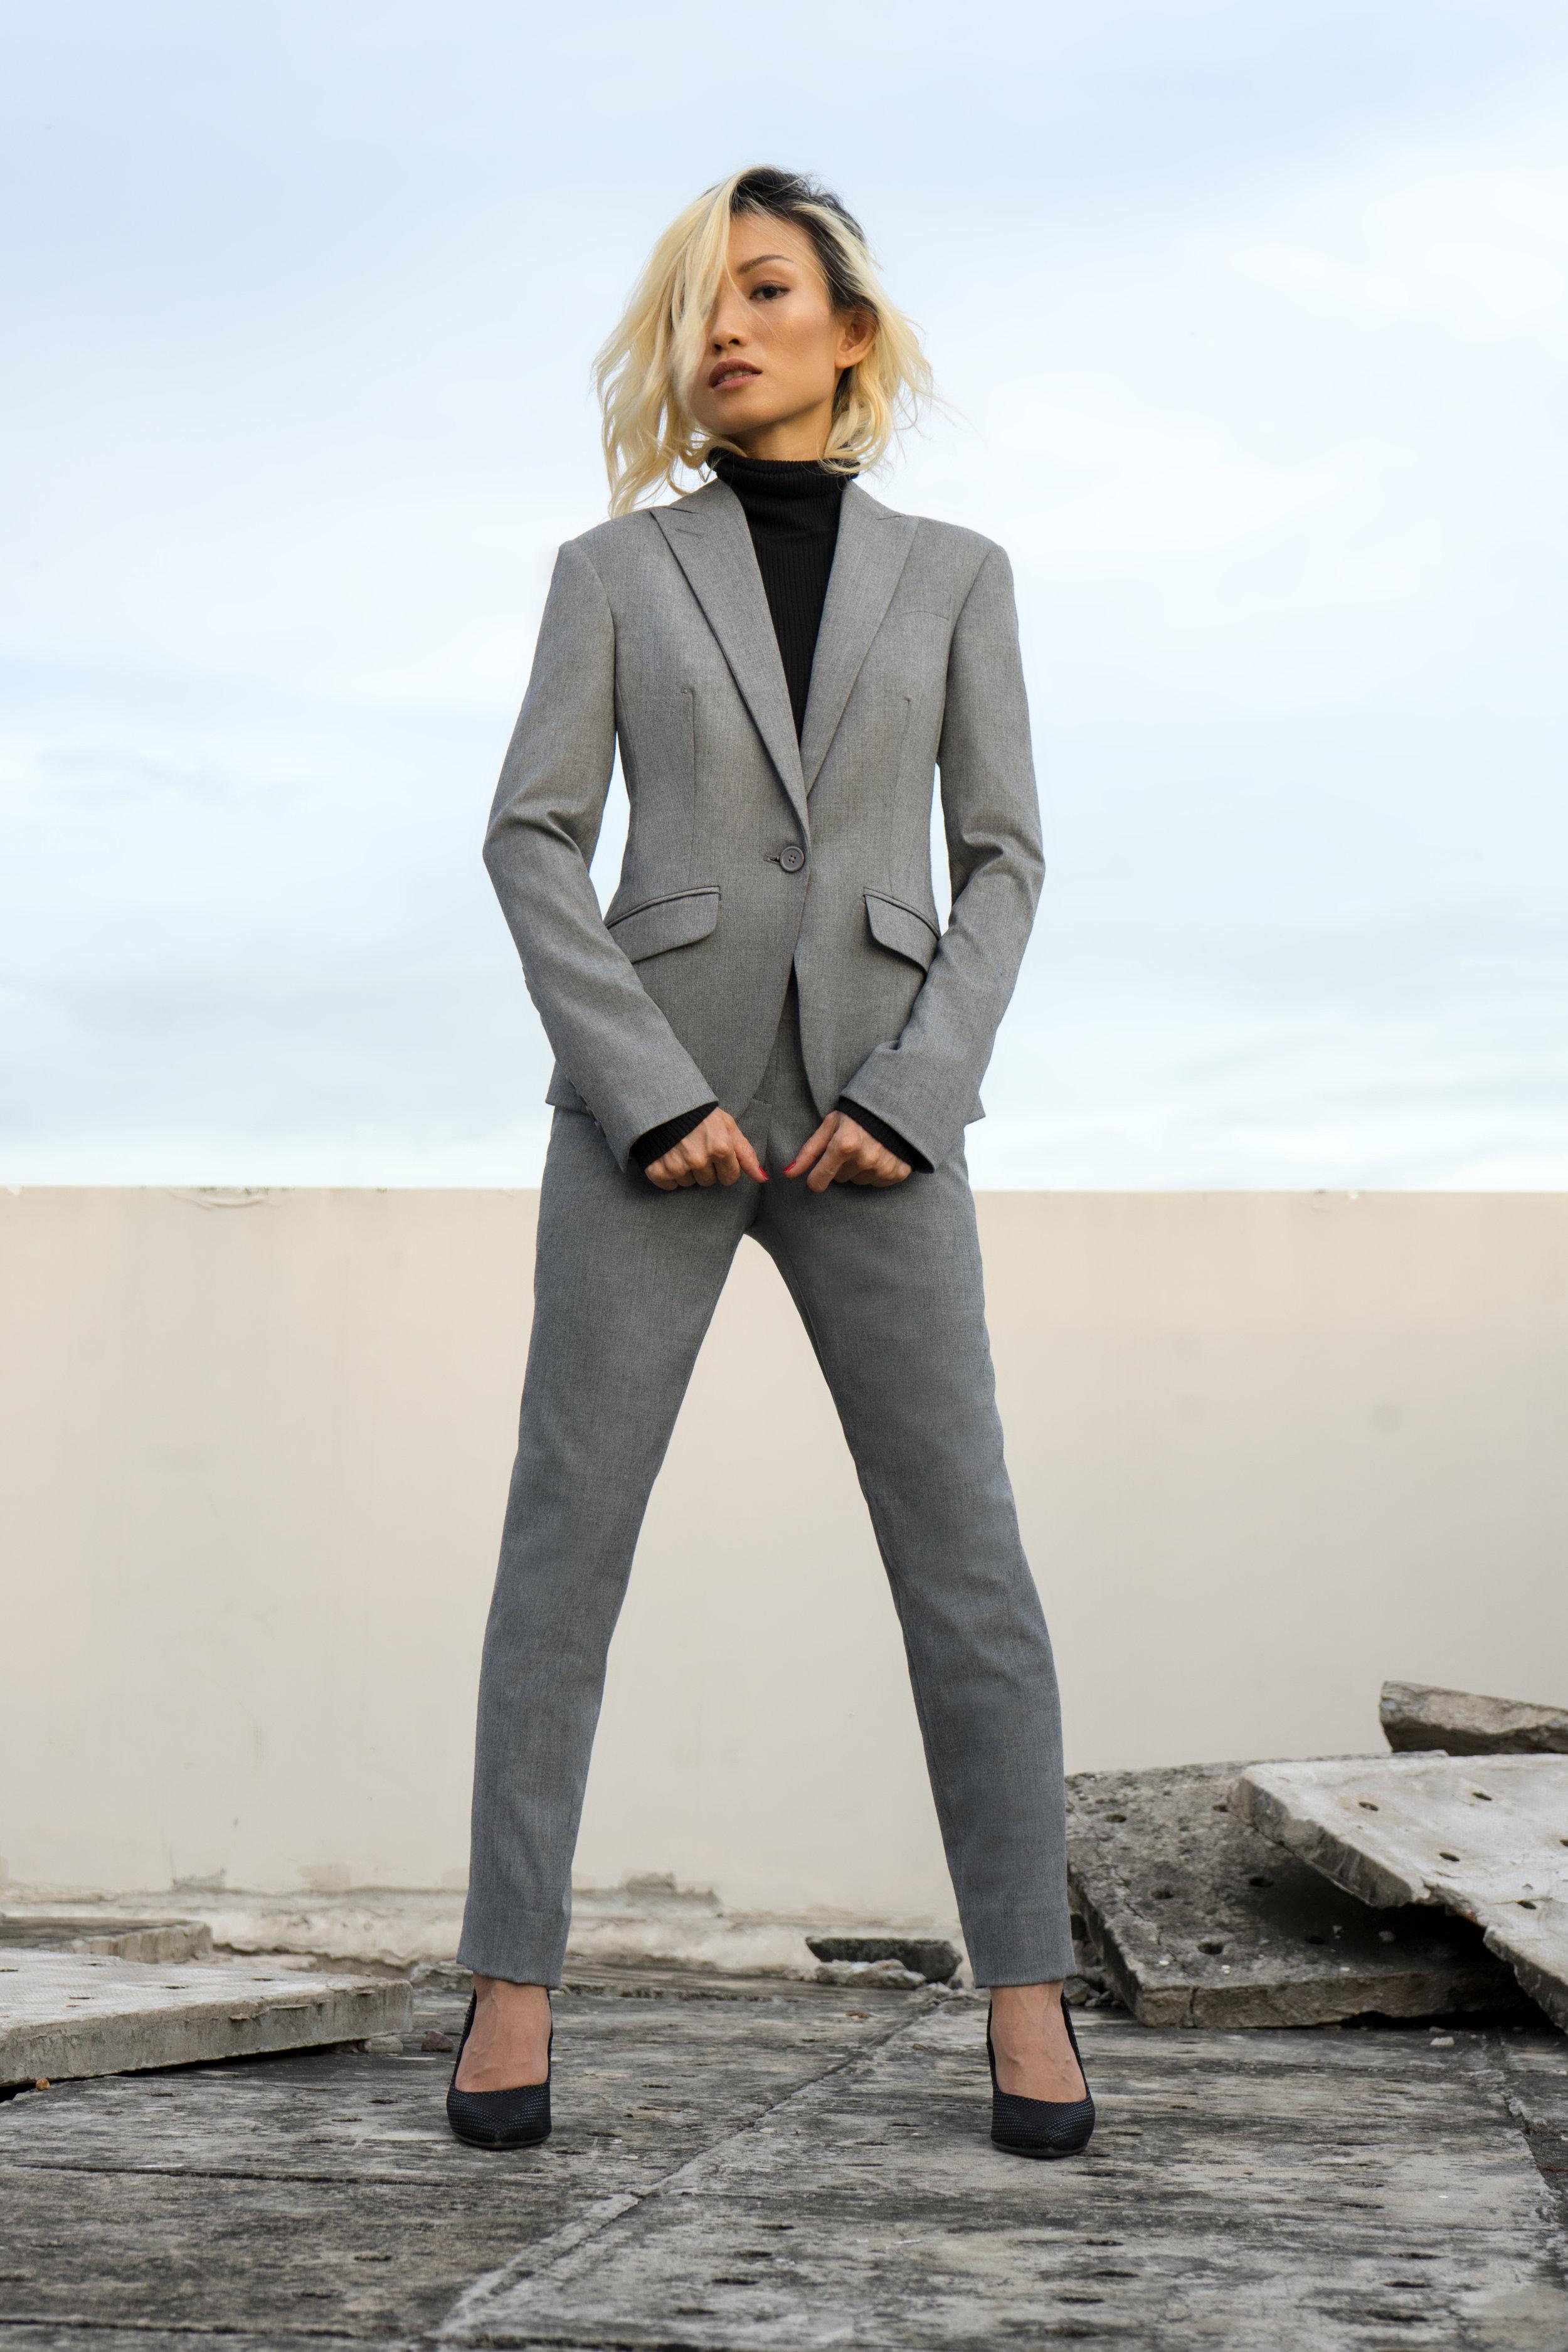 ladies' light grey pant suit with a black turtle neck top